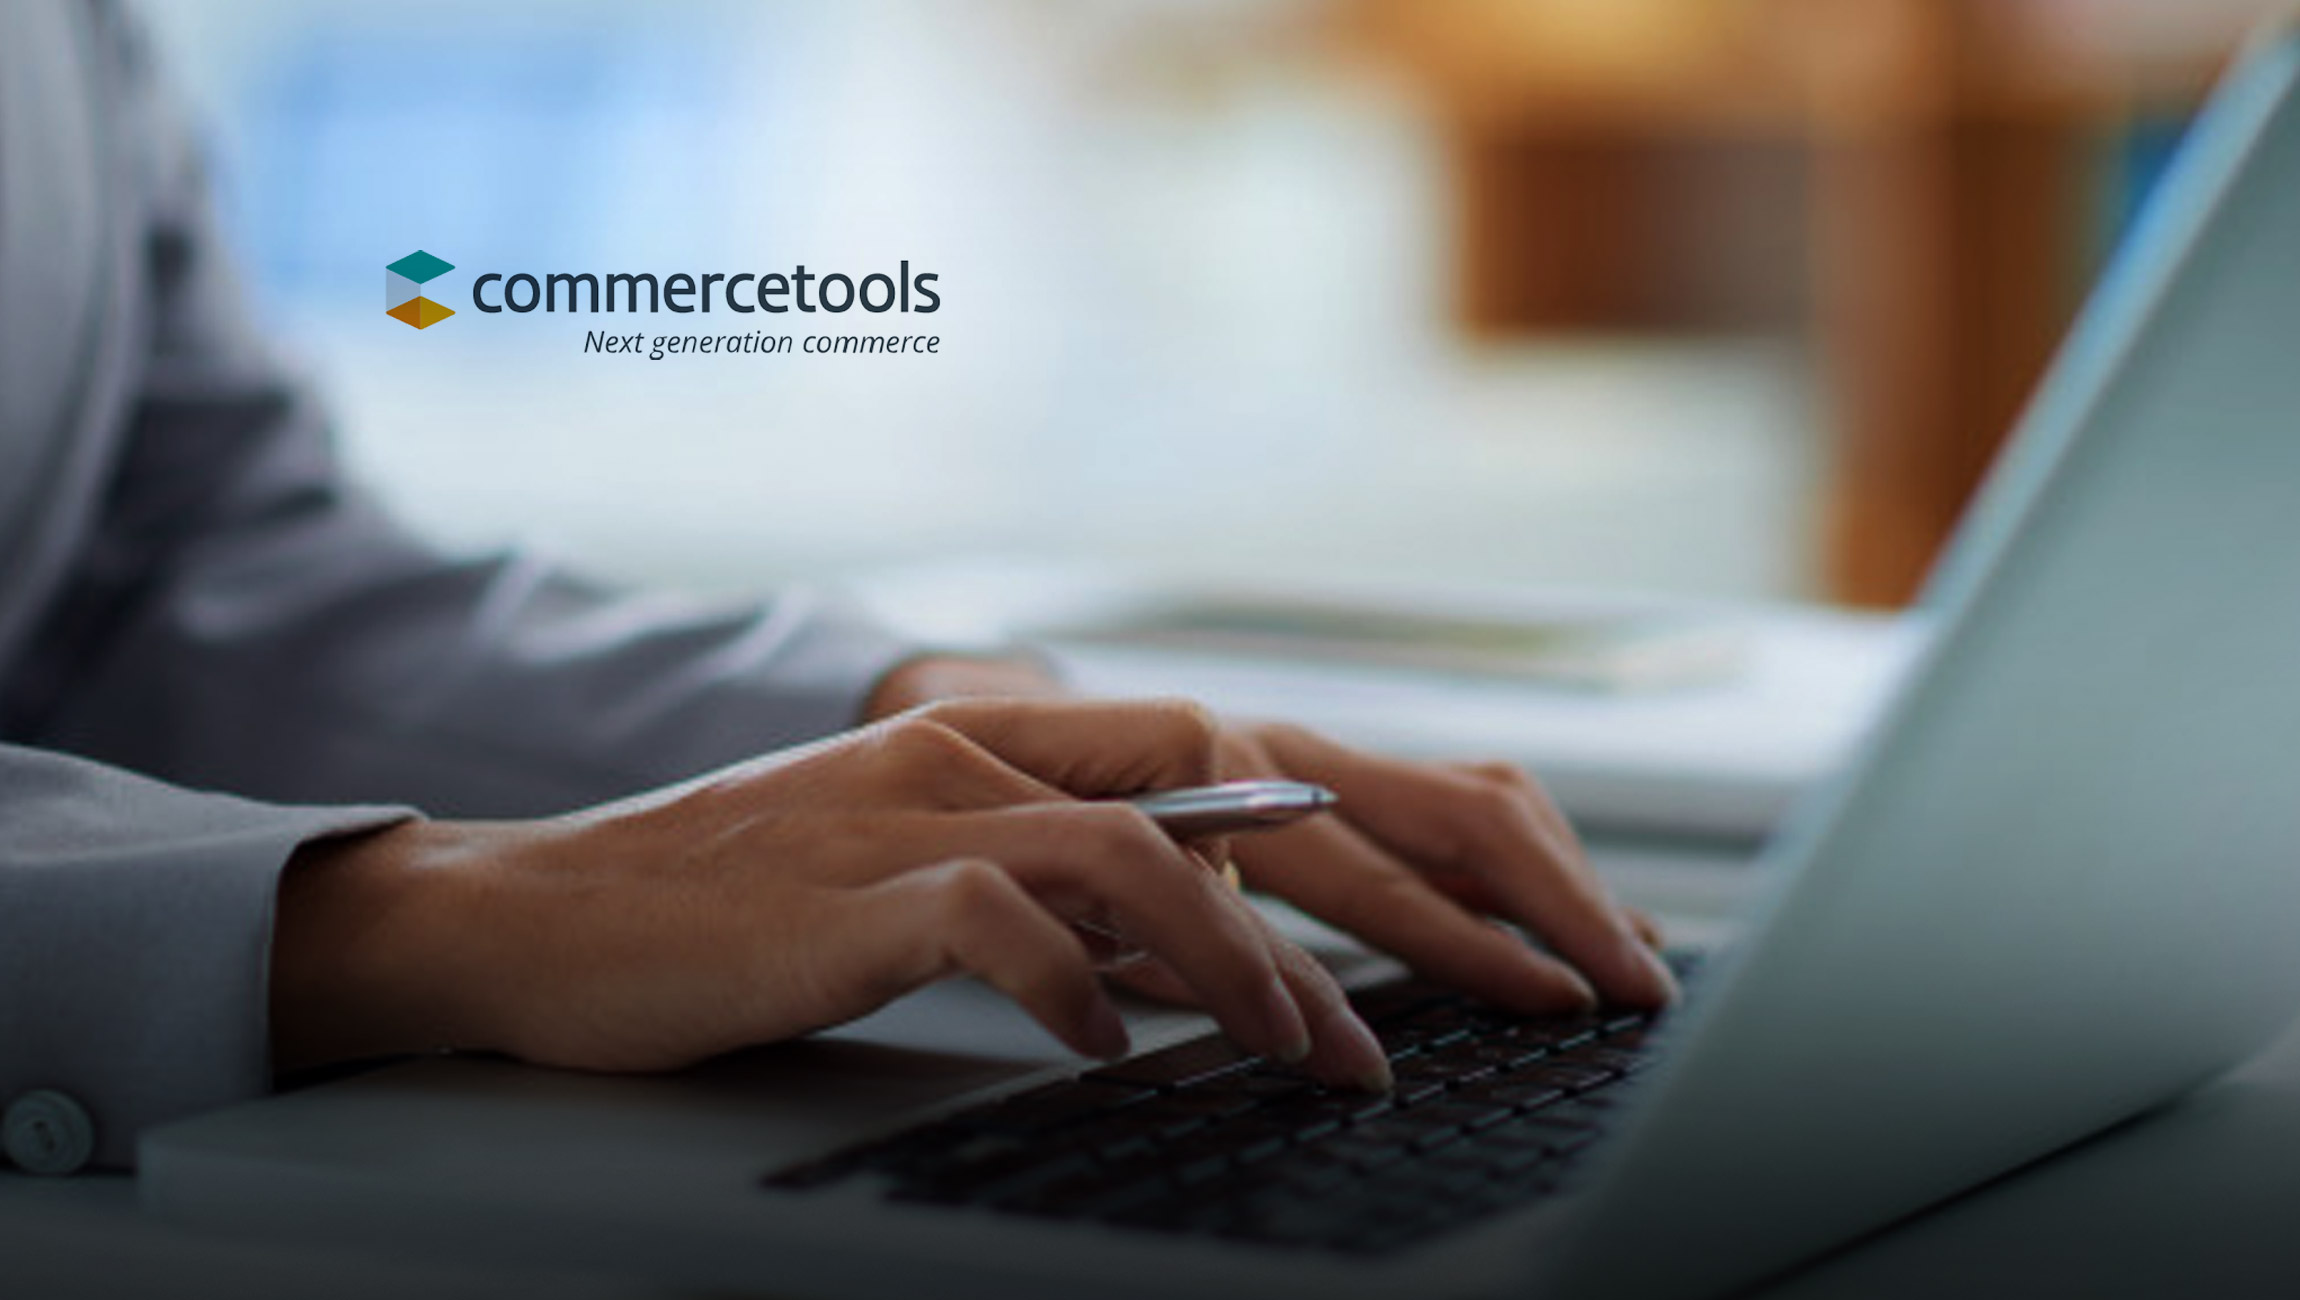 commercetools Recognized for B2B Commerce